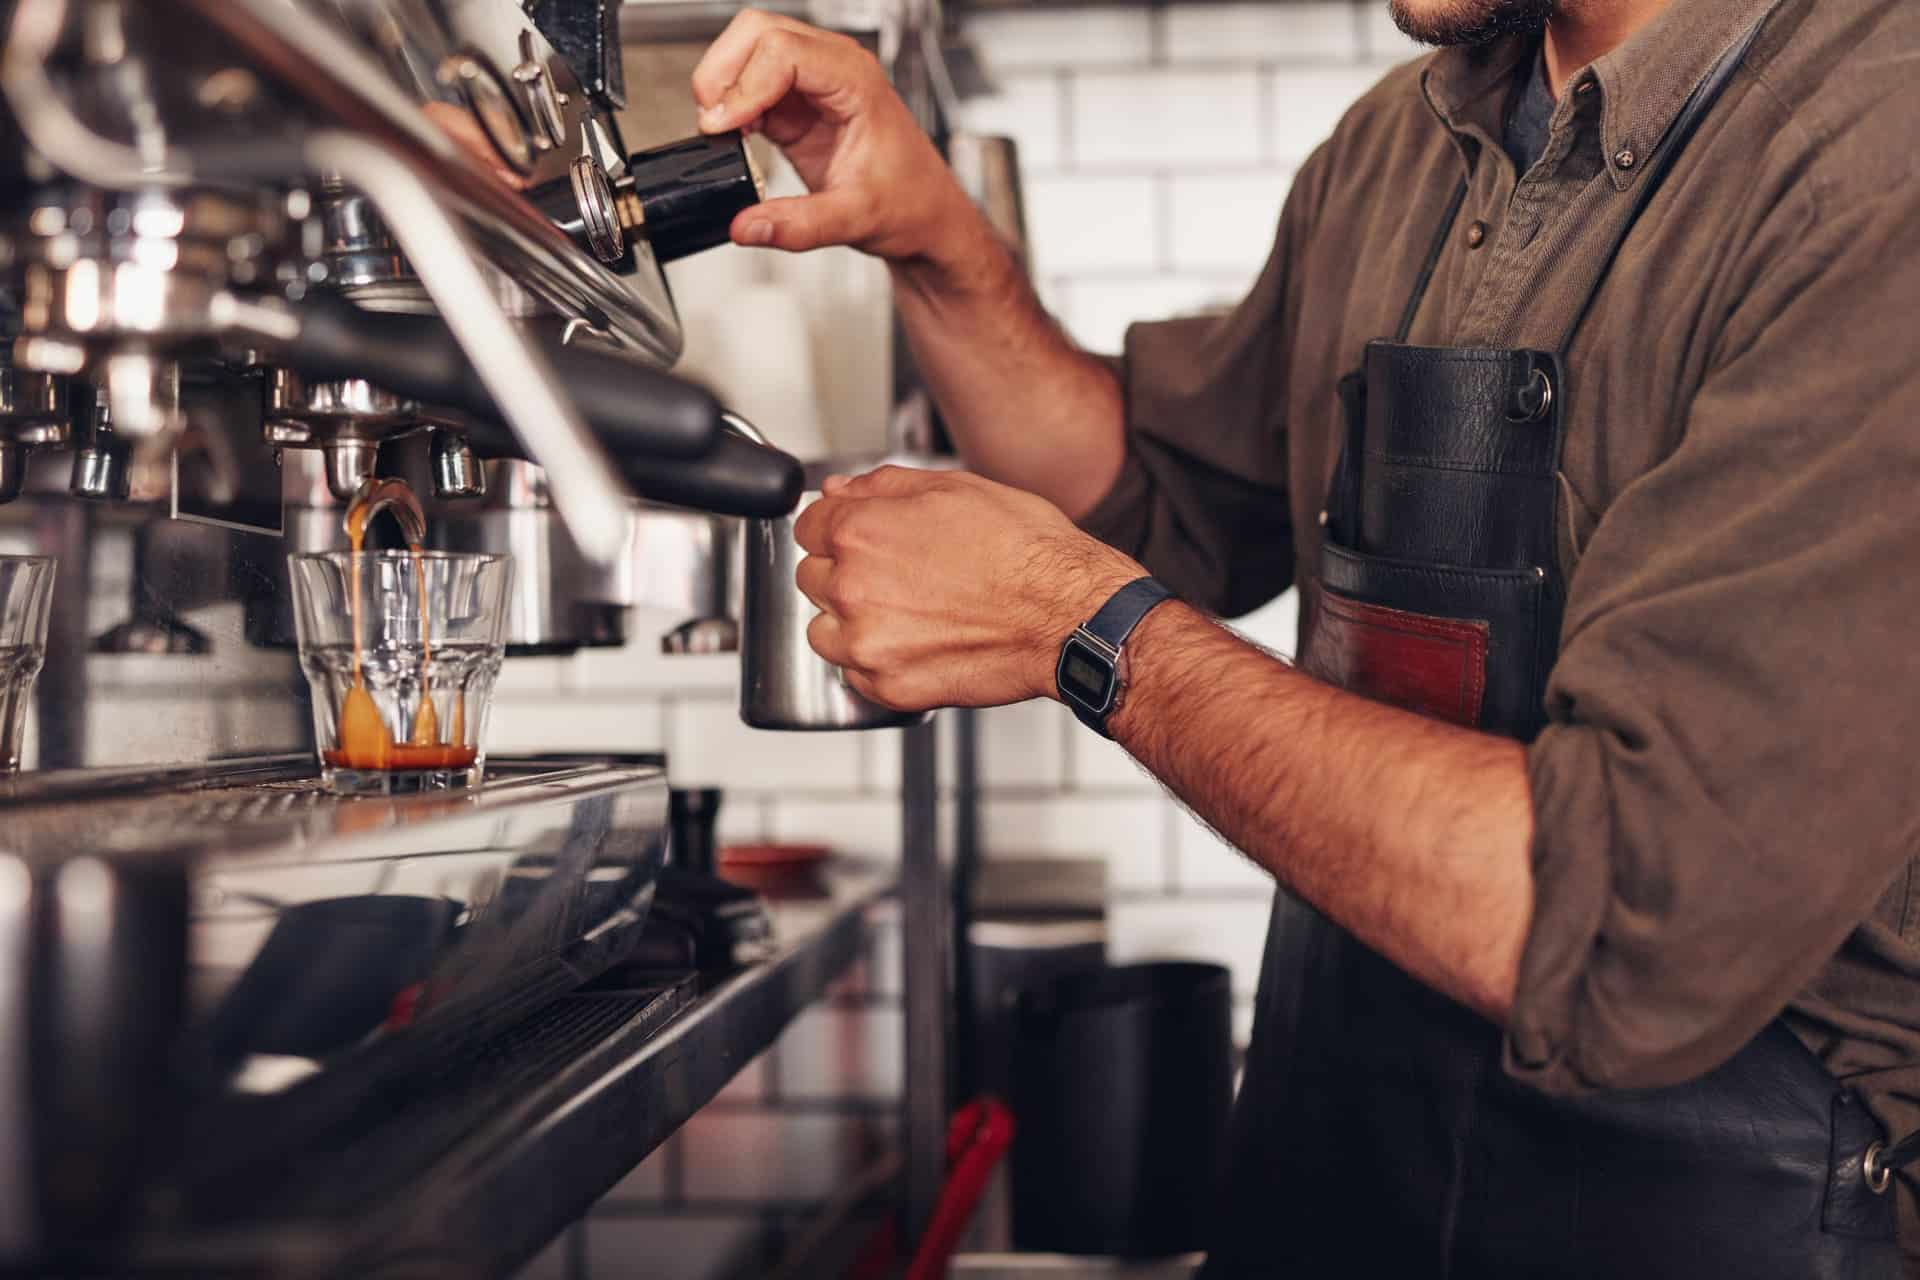 barista making coffee using a coffee maker PGK3YJF